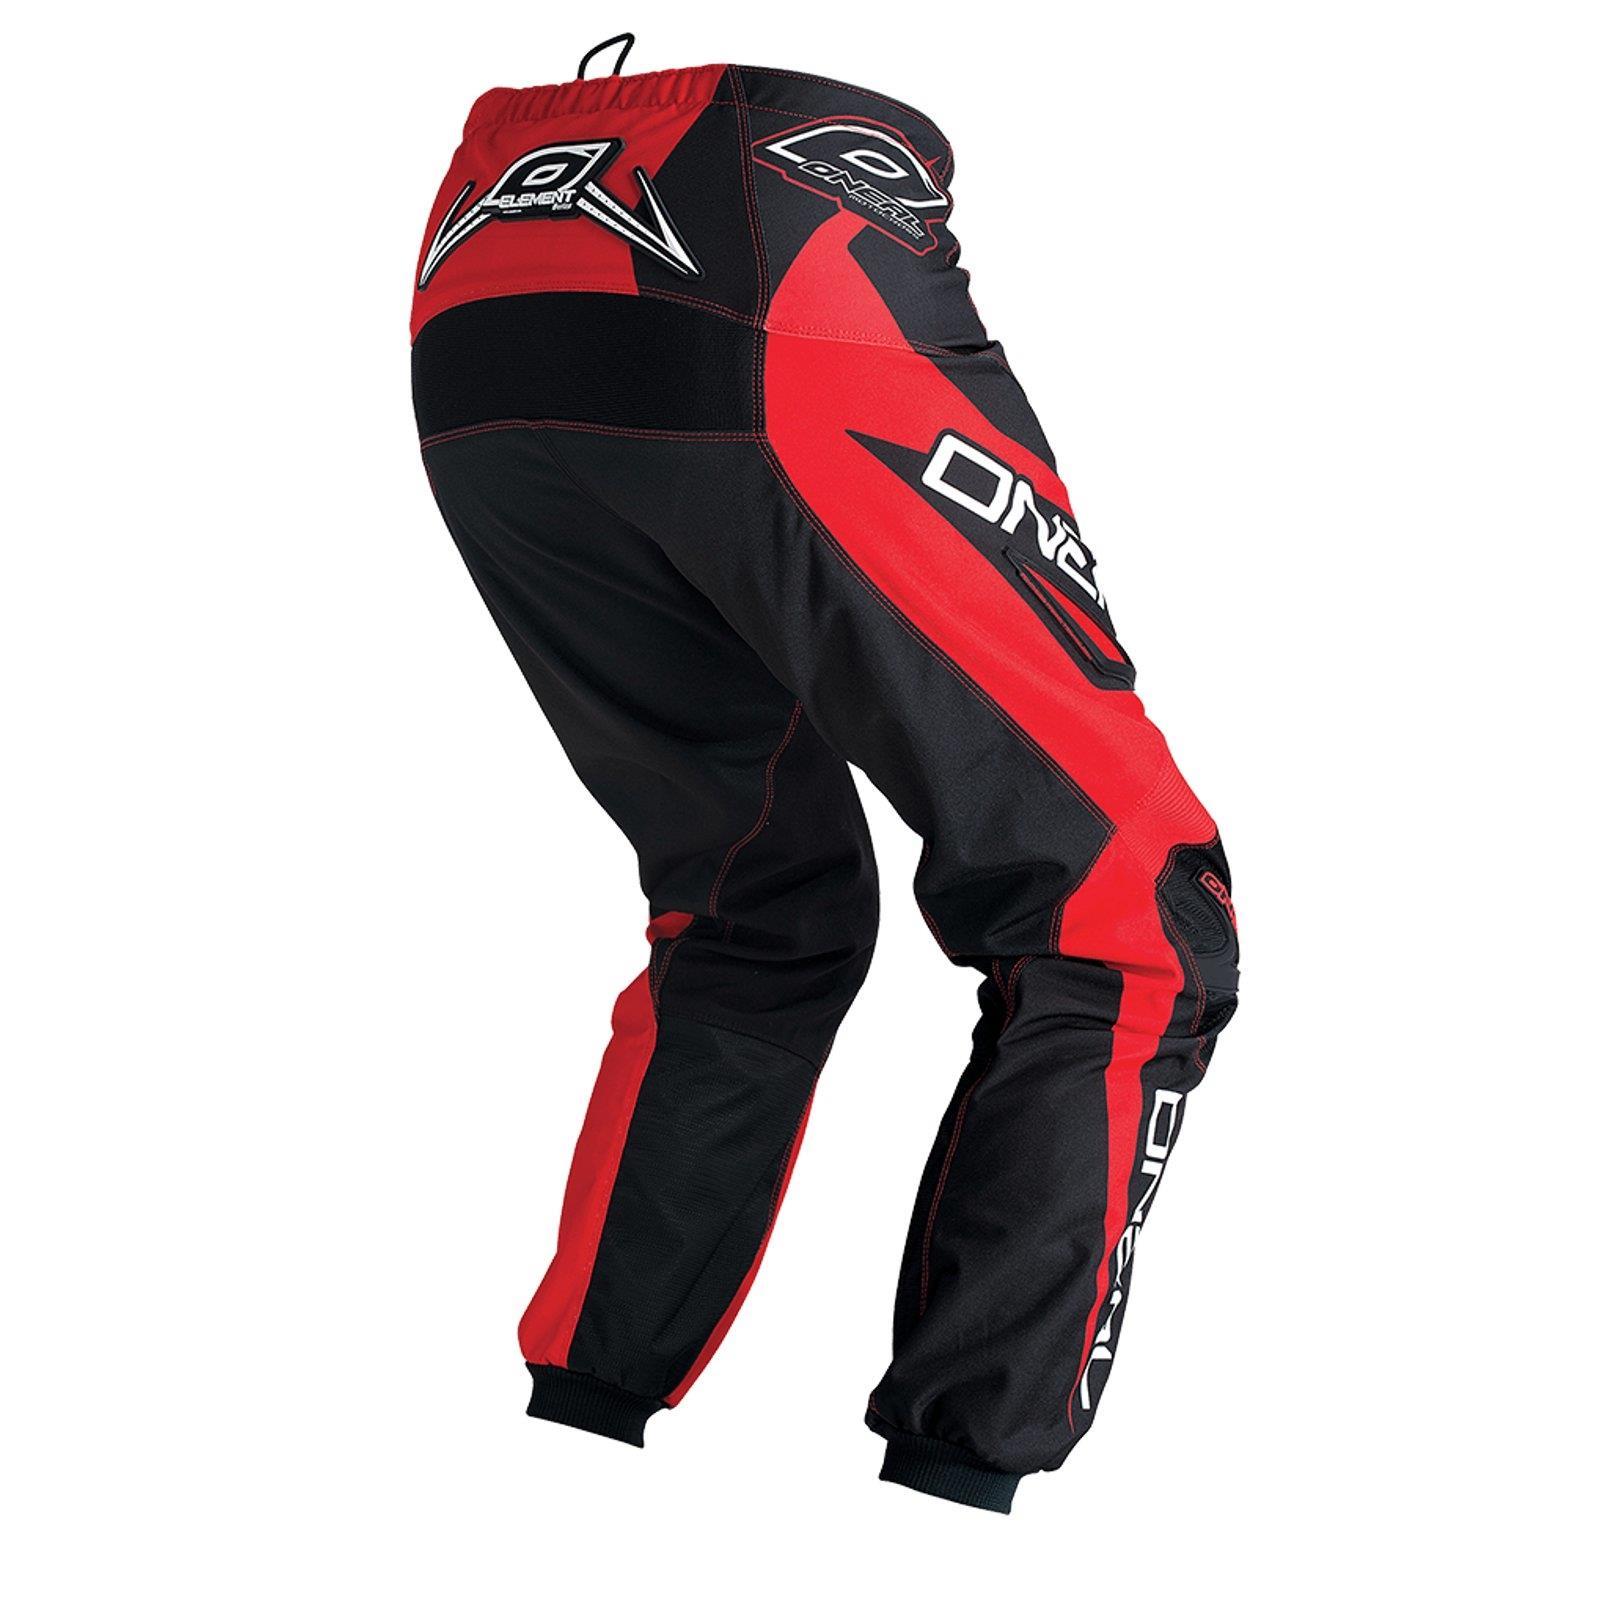 ONeal-pantalones-de-Jersey-de-los-ninos-de-pantalones-cortos-ninos-MX-bicicleta-DH-montana-bicicleta miniatura 22